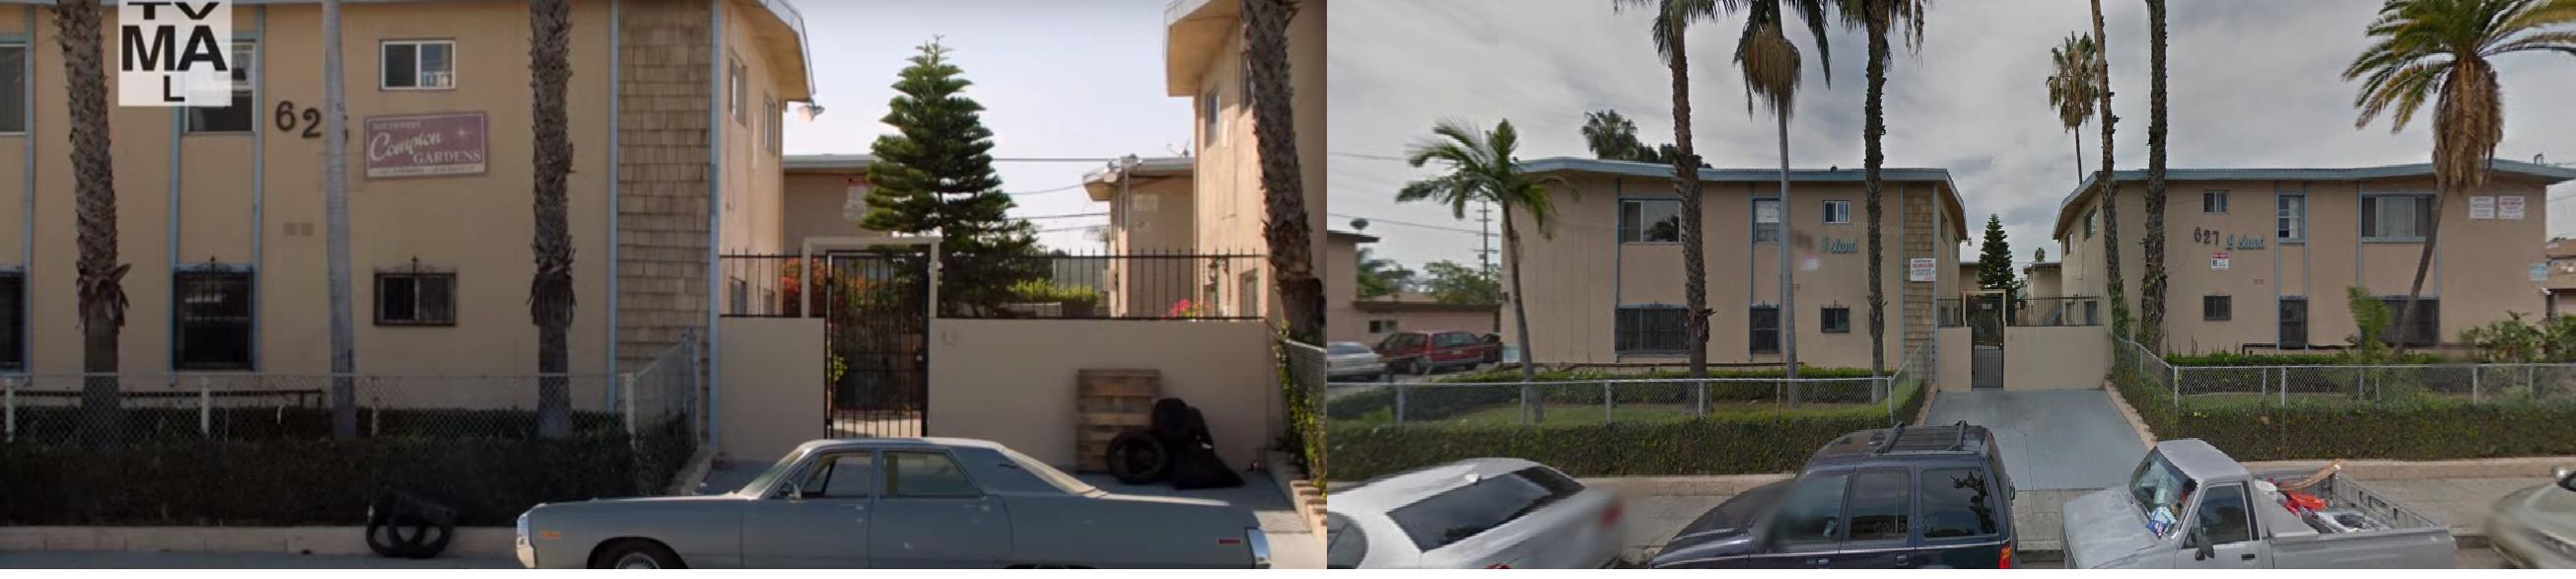 black-jesus-filming-locations-the-apartment